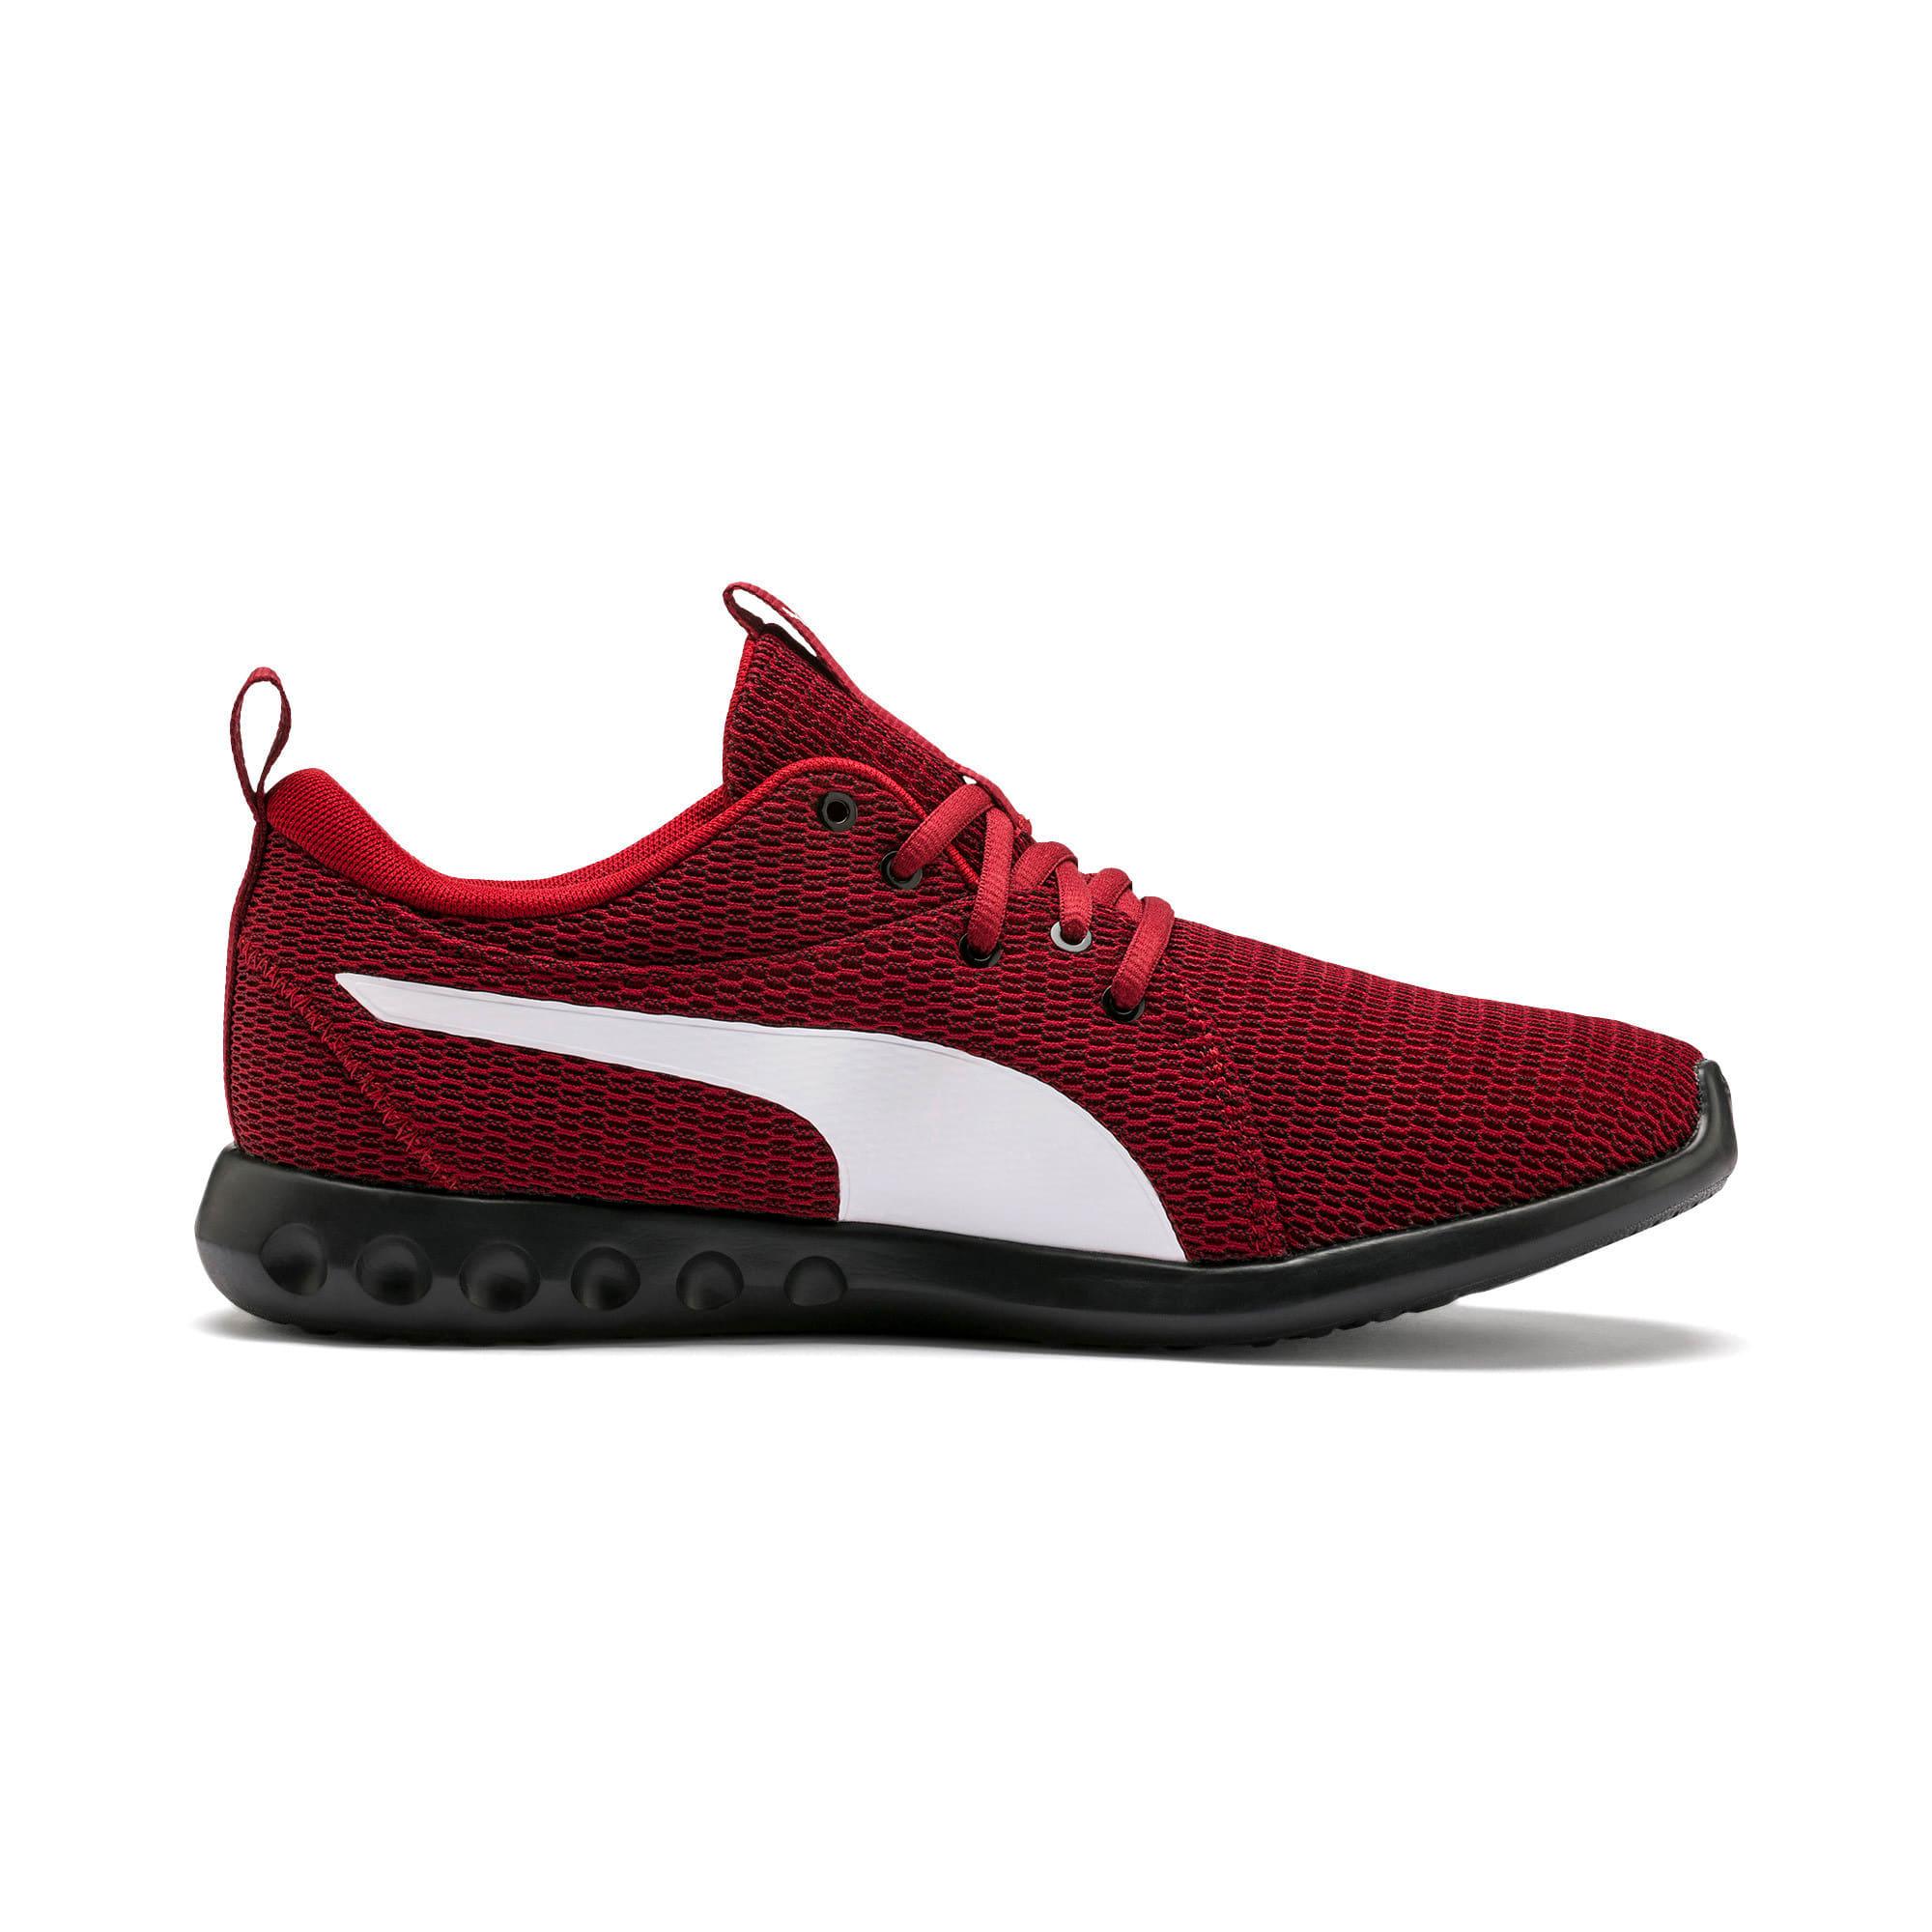 Thumbnail 6 of Carson 2 New Core Men's Running Shoes, Rhubarb-White-Black, medium